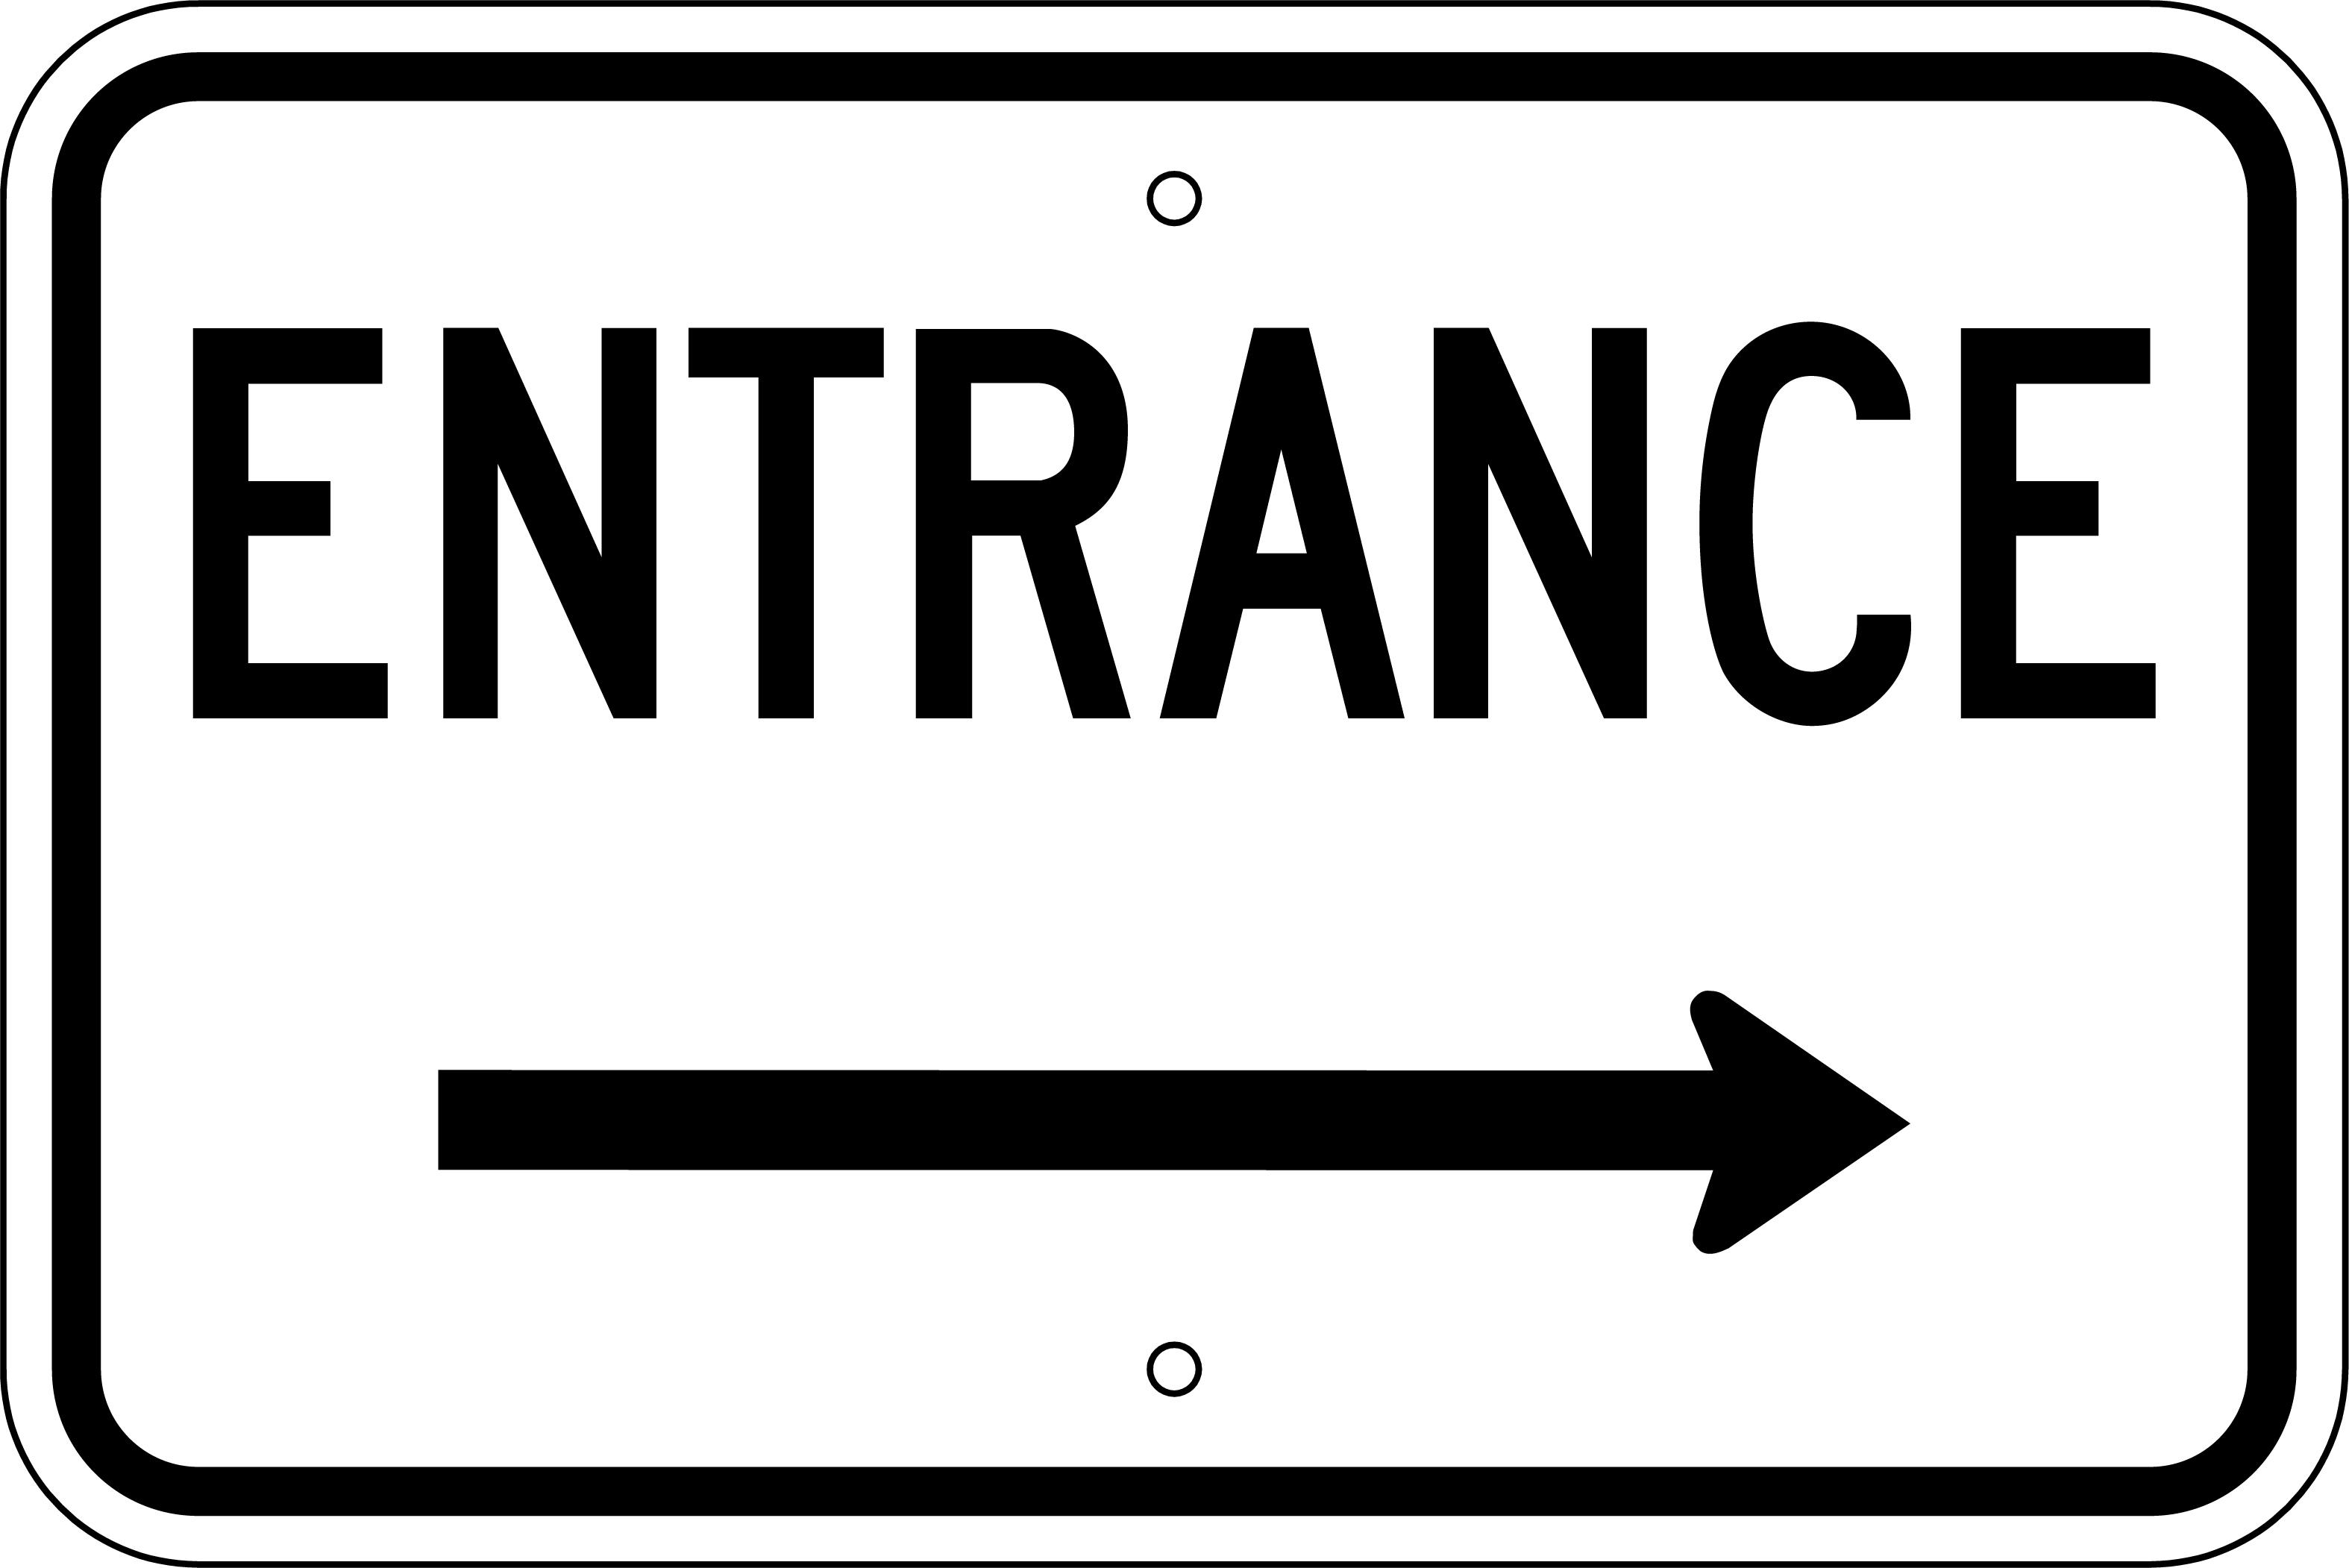 Entrance left arrow clipart